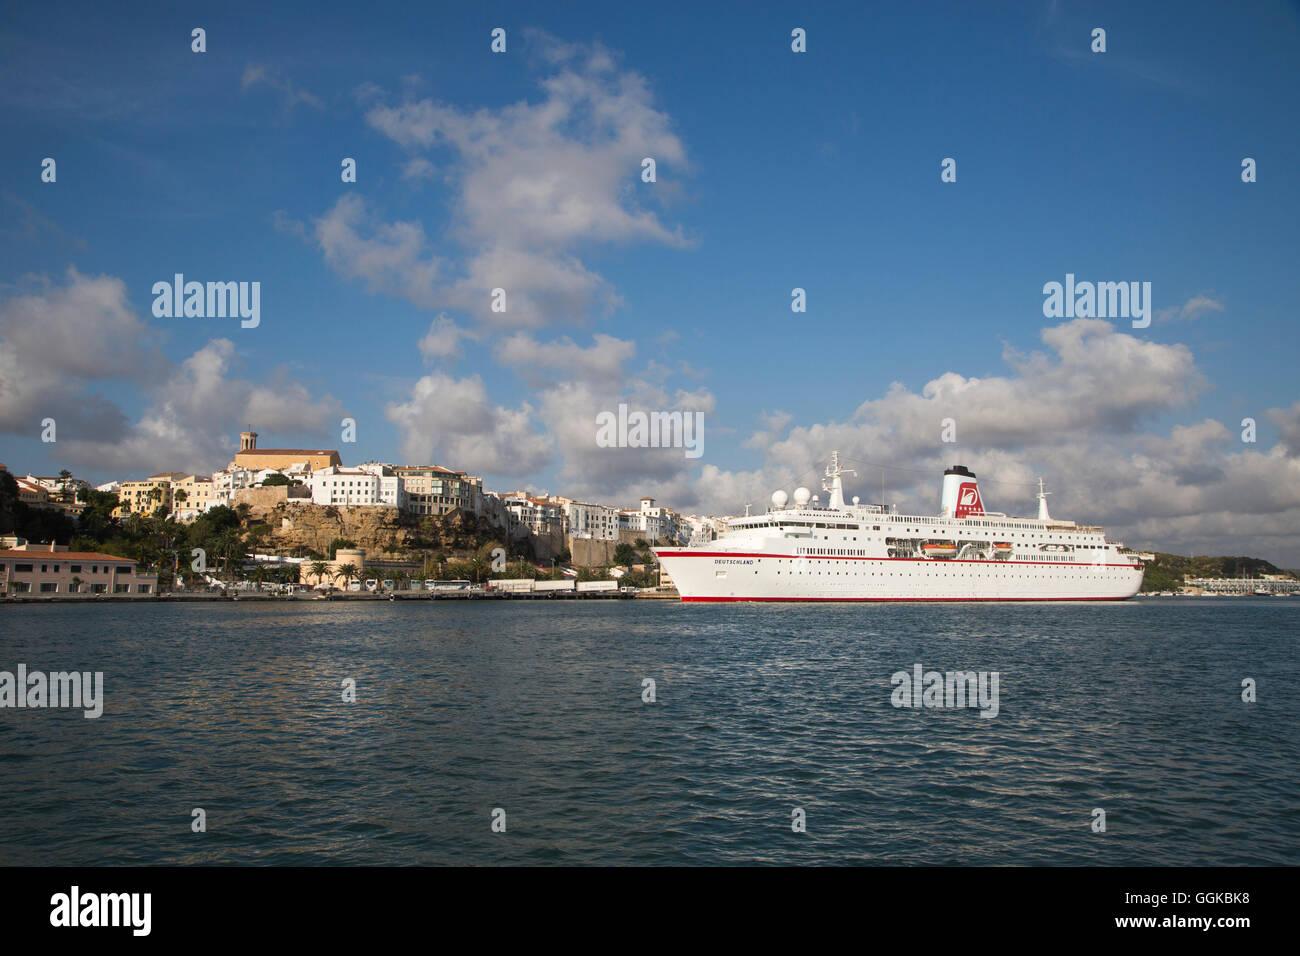 Cruise ship MS Deutschland (Reederei Peter Deilmann) approaching Mahon pier, Mahon, Menorca, Balearic Islands, Spain - Stock Image